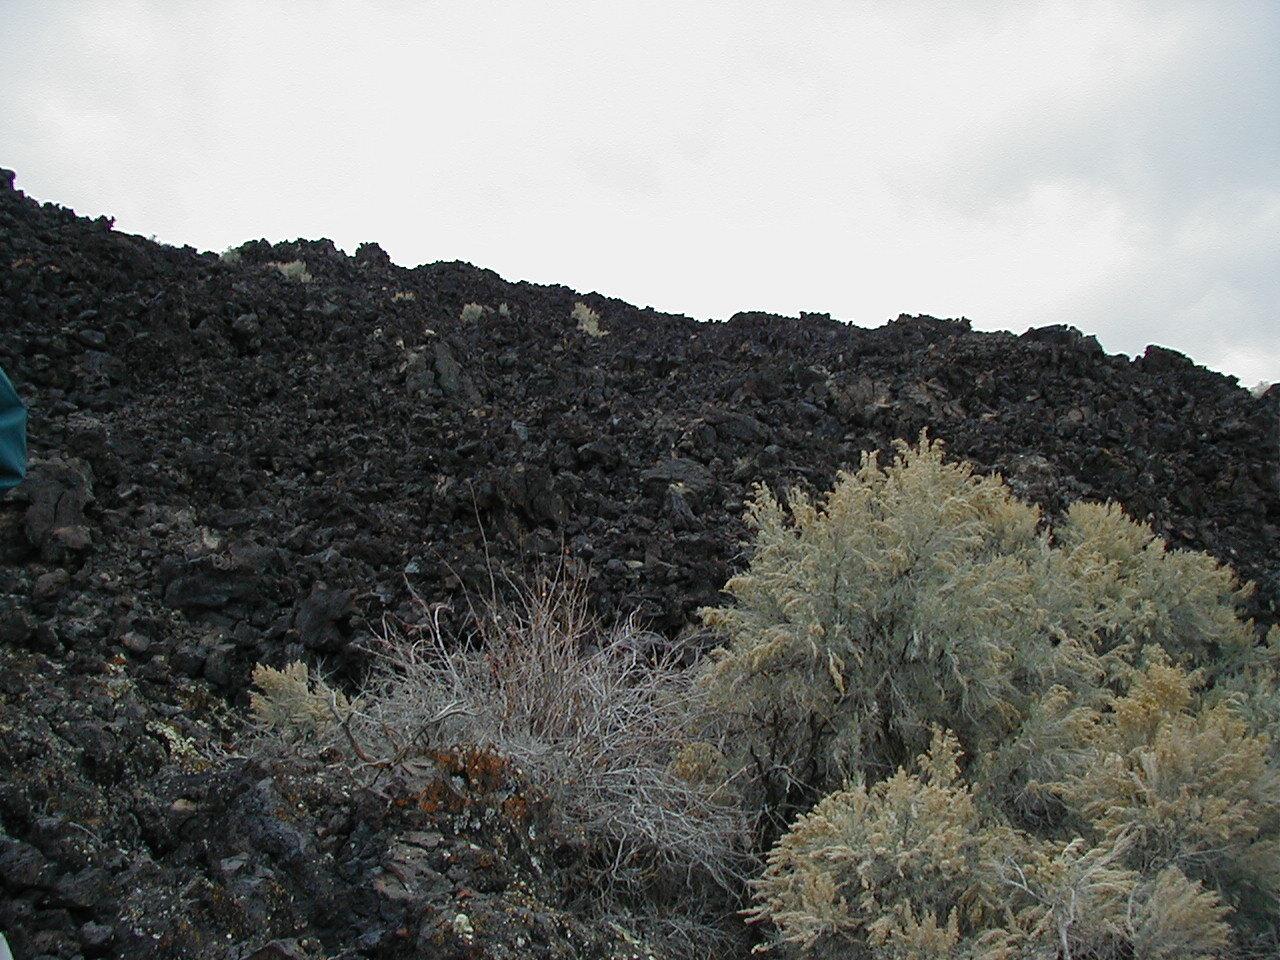 Unusual earthquakes highlight central Utah volcanoes